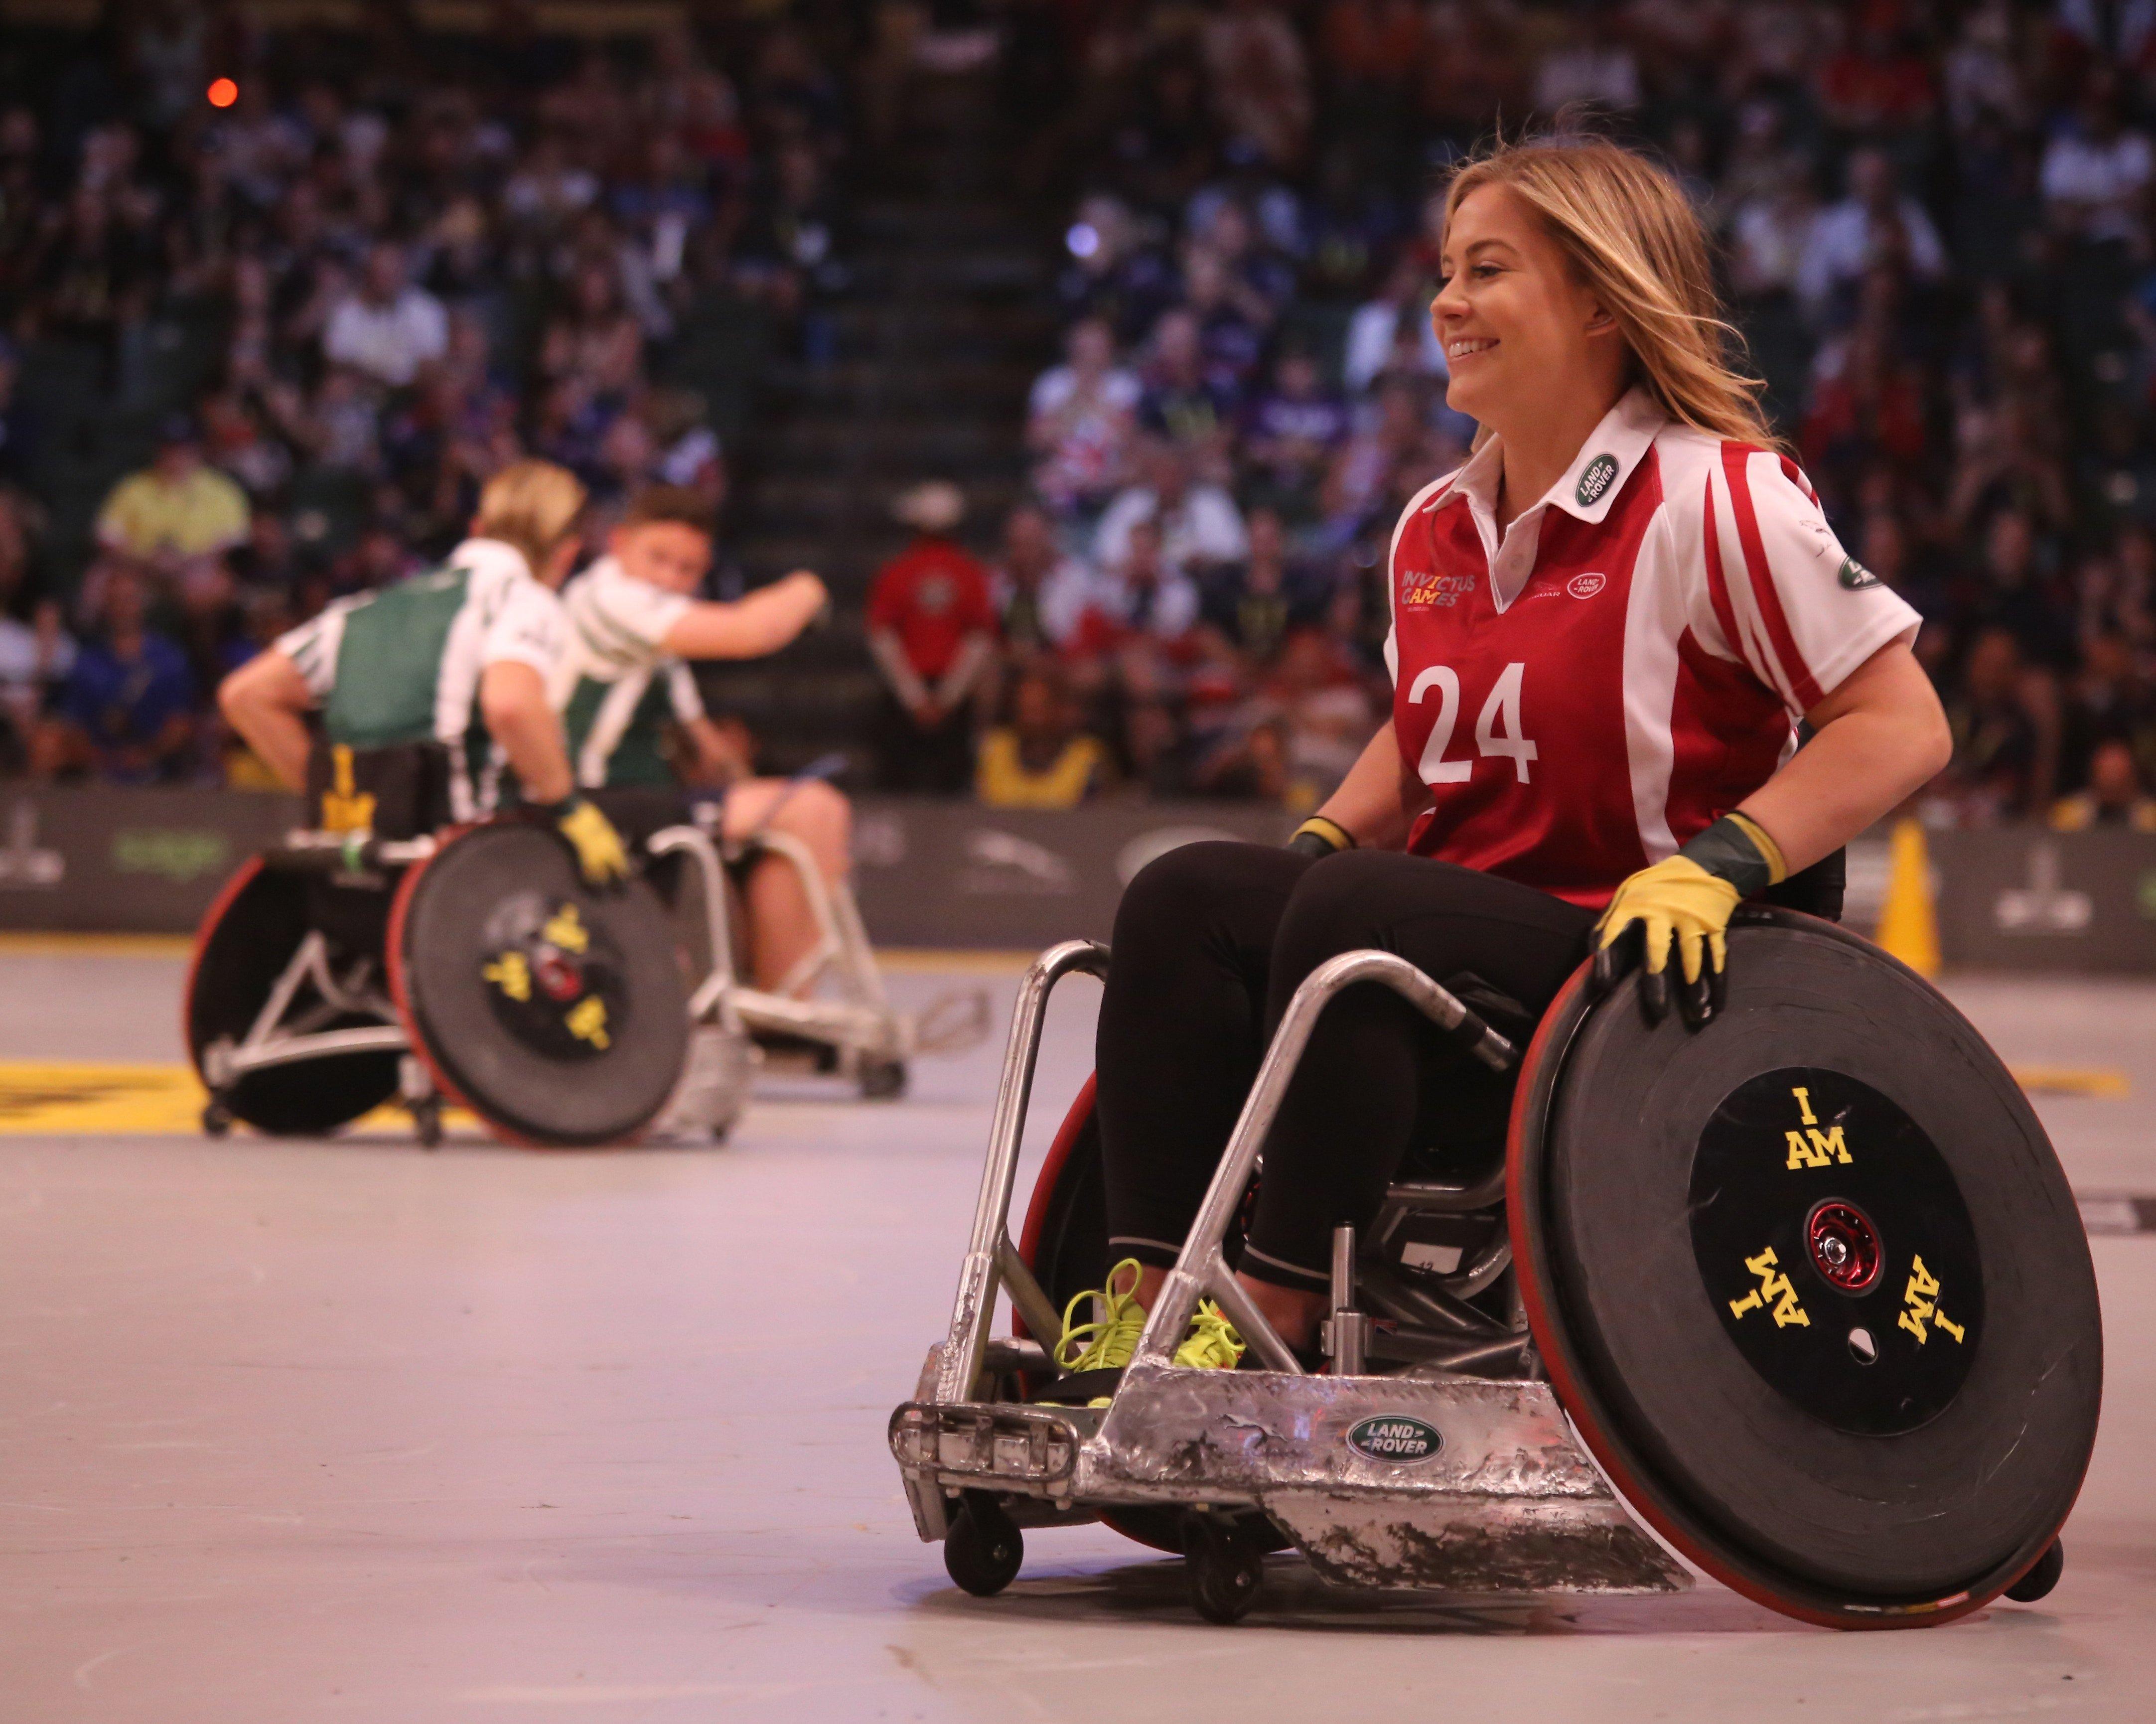 Does God create disabilities?